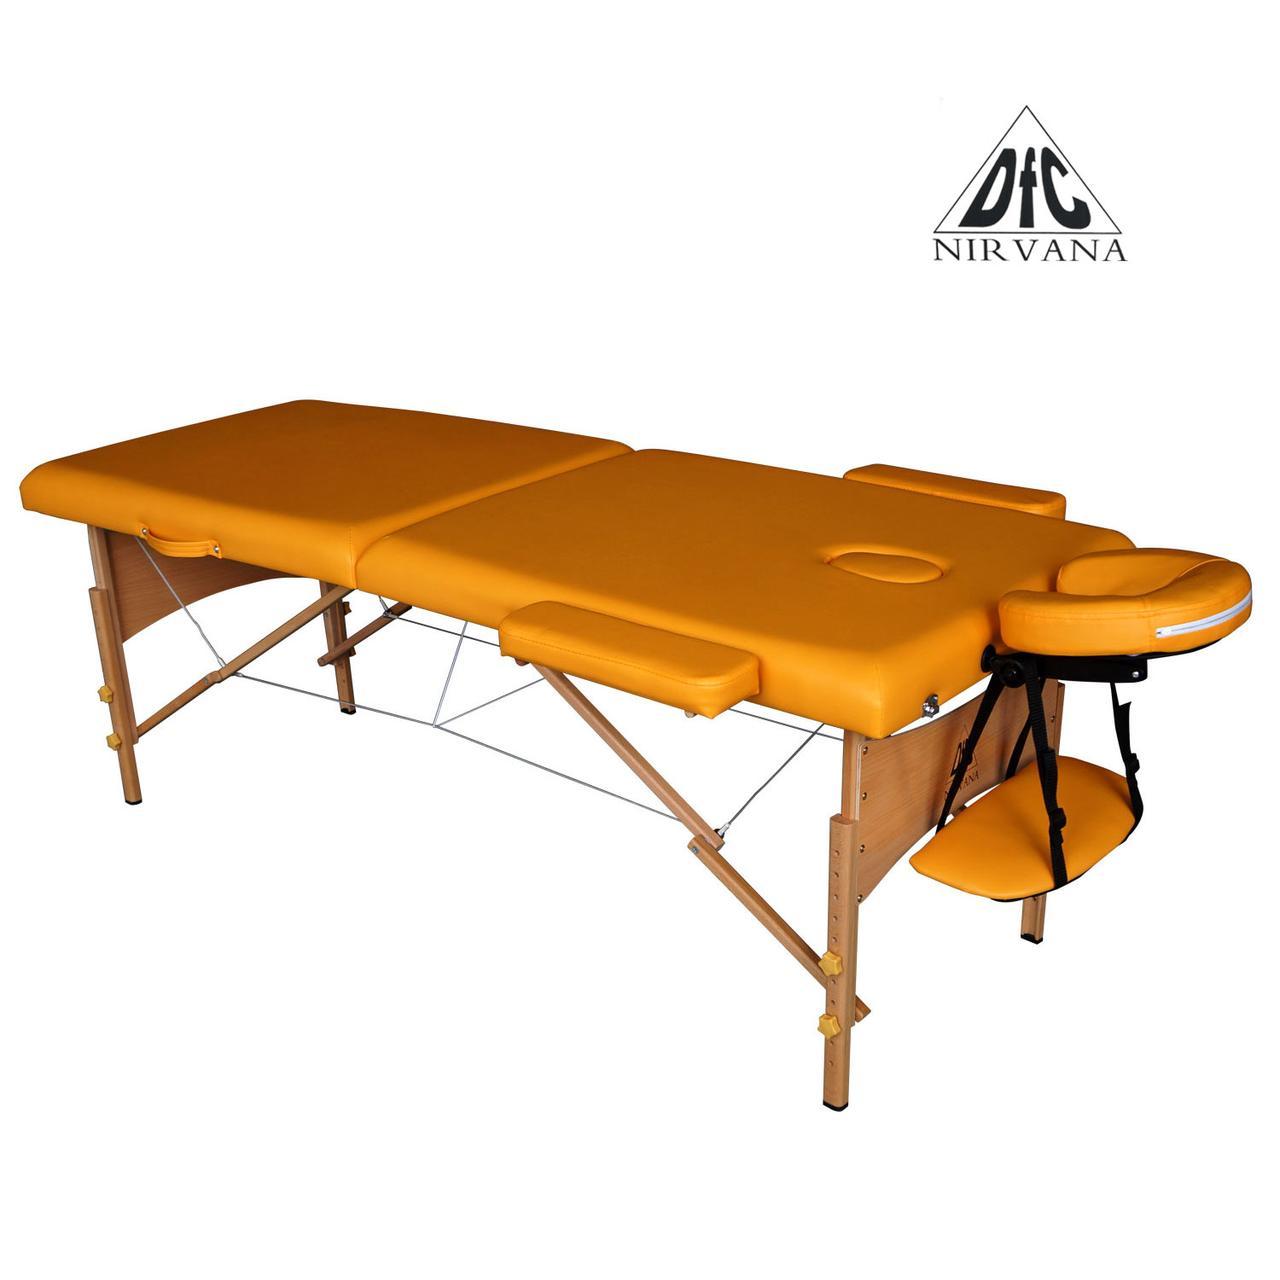 Массажный стол DFC NIRVANA Relax (Mustard)